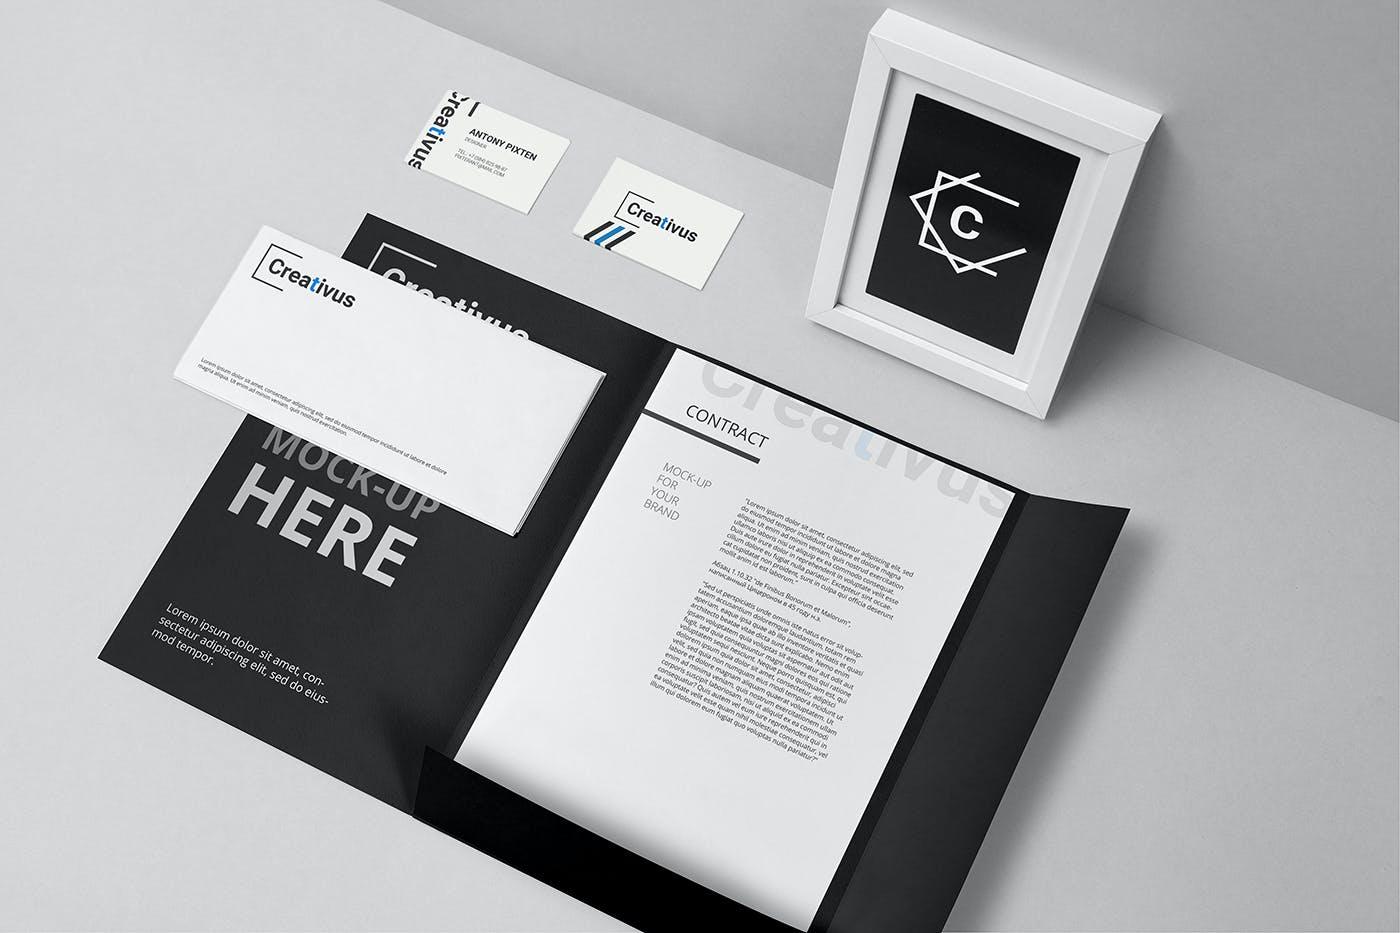 7款品牌LOGO设计办公用品展示贴图样机 Branding Stationery Mockup插图(3)